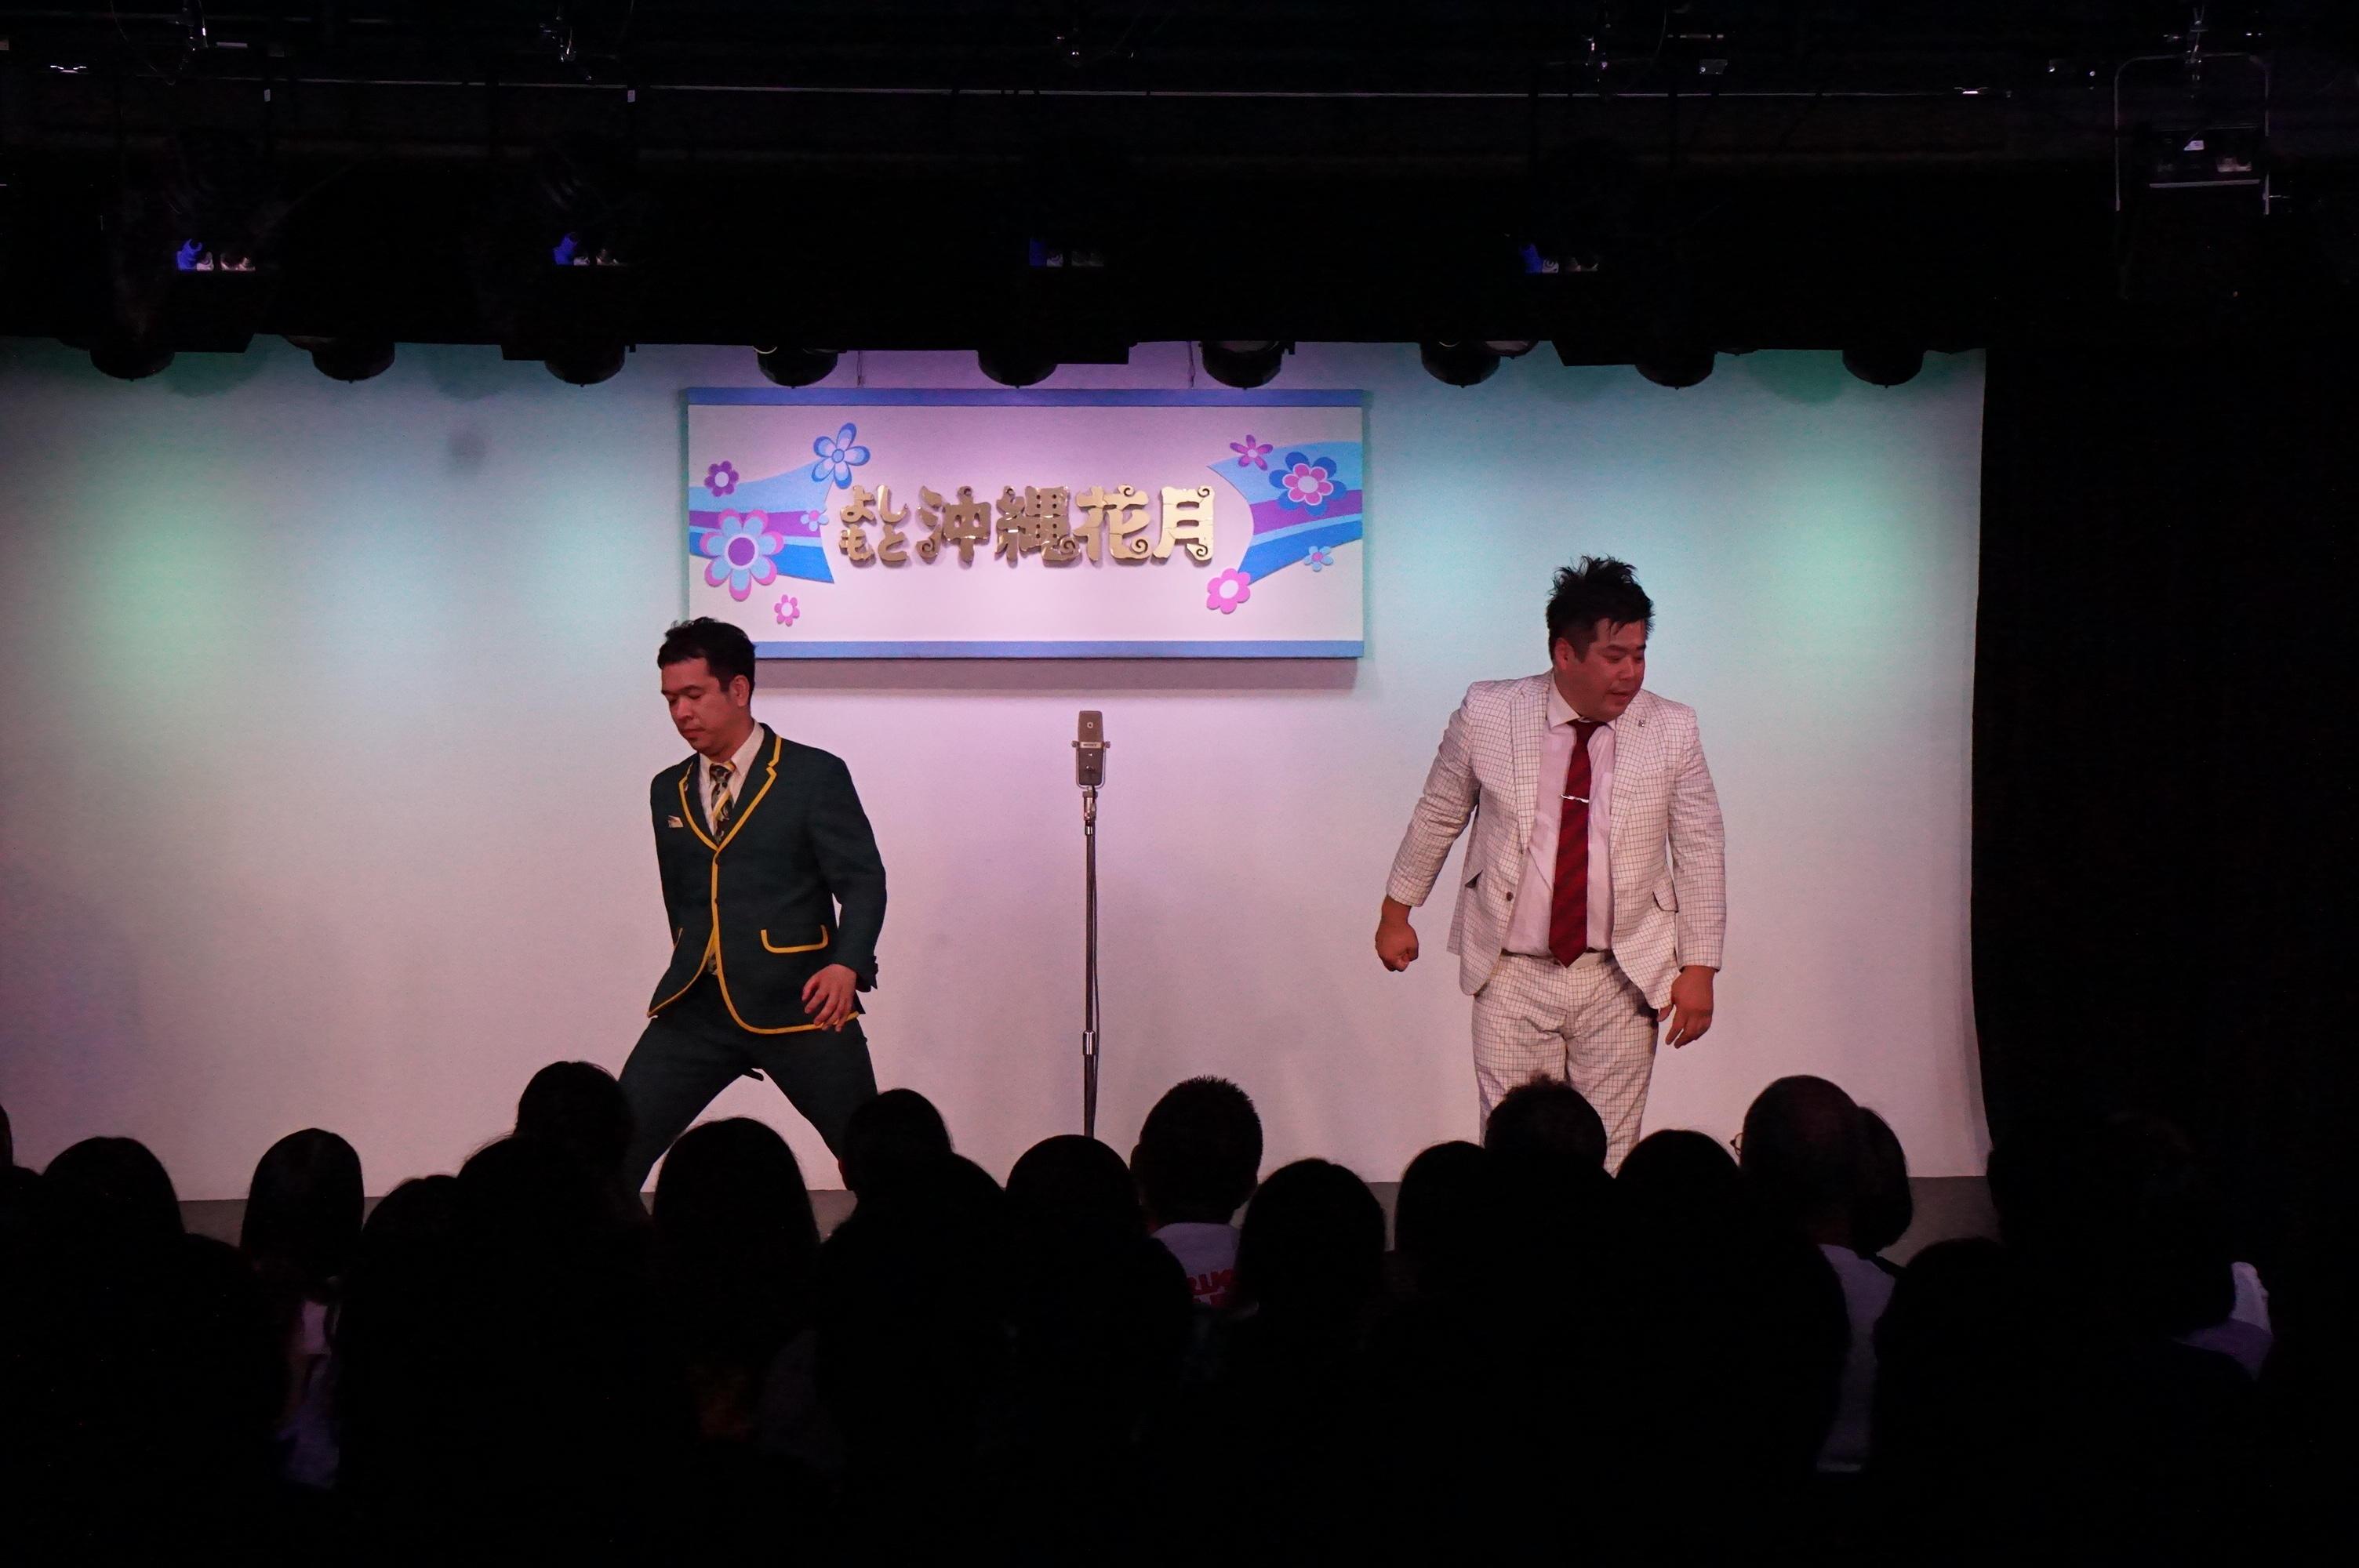 http://news.yoshimoto.co.jp/20180806141444-efbd5a67787c8a6dd0e718243efae4aff9933095.jpg